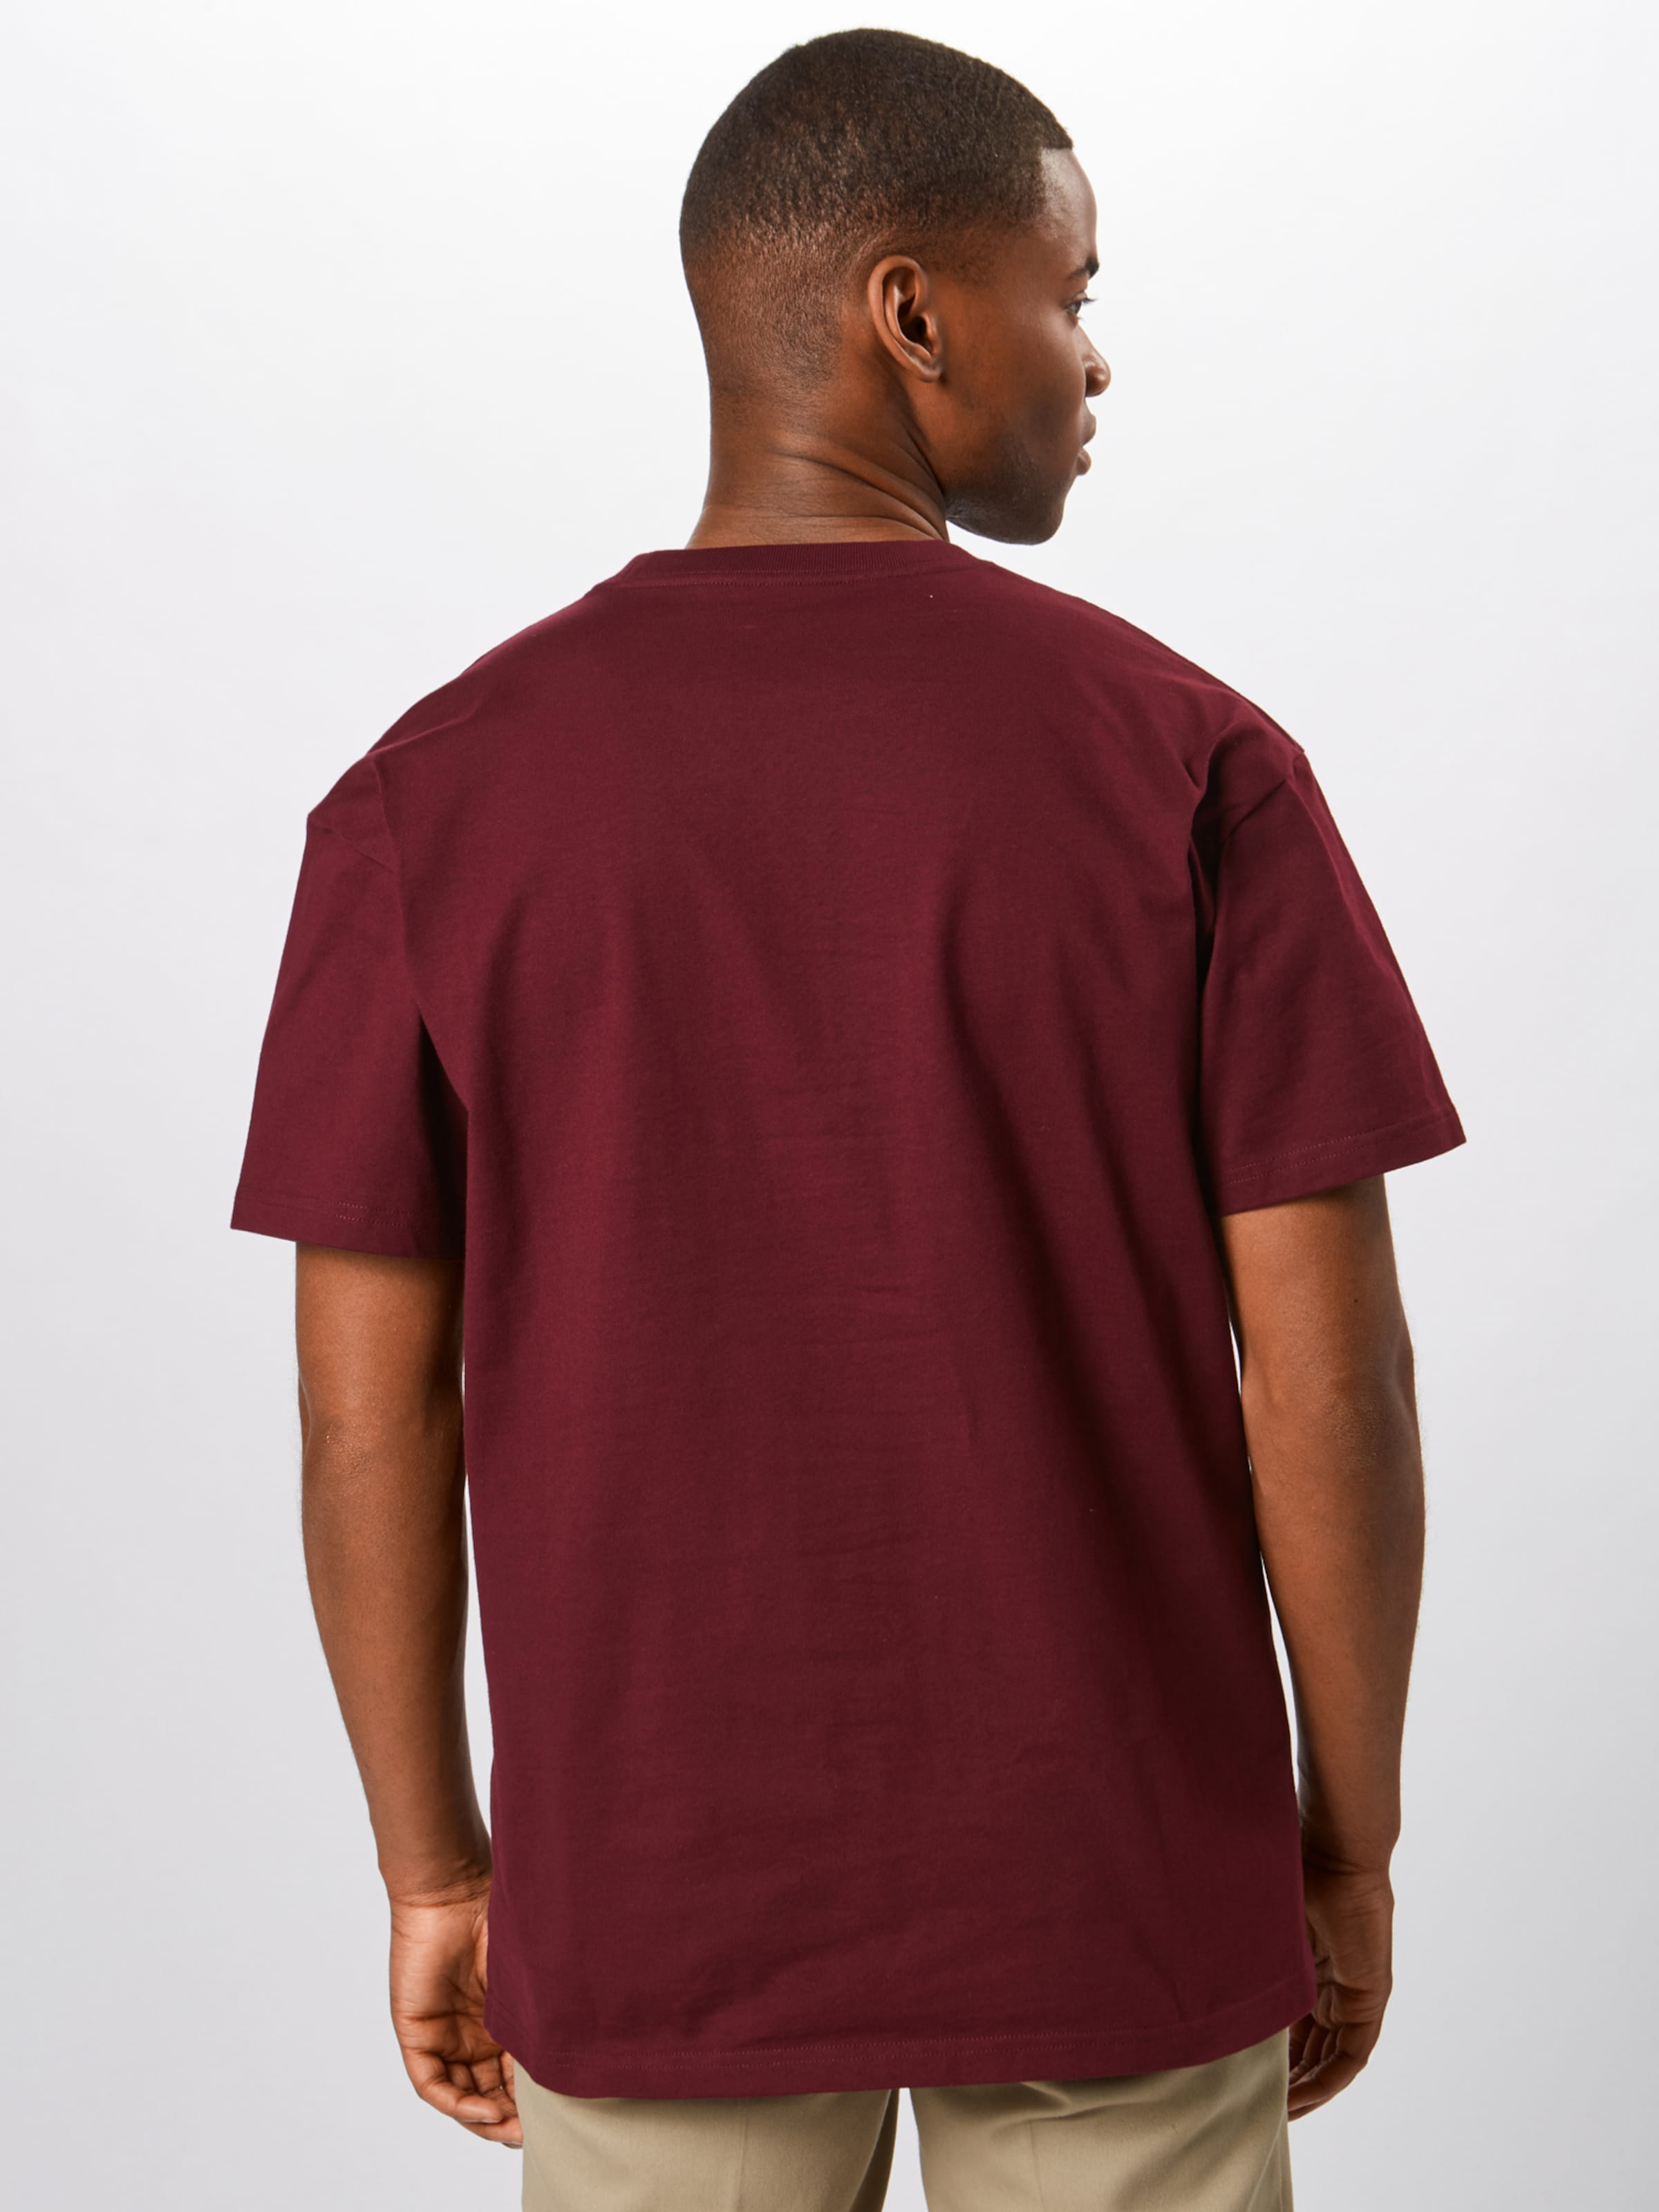 Carhartt Wip En 'chase' shirt Merlot T SUVqMpz